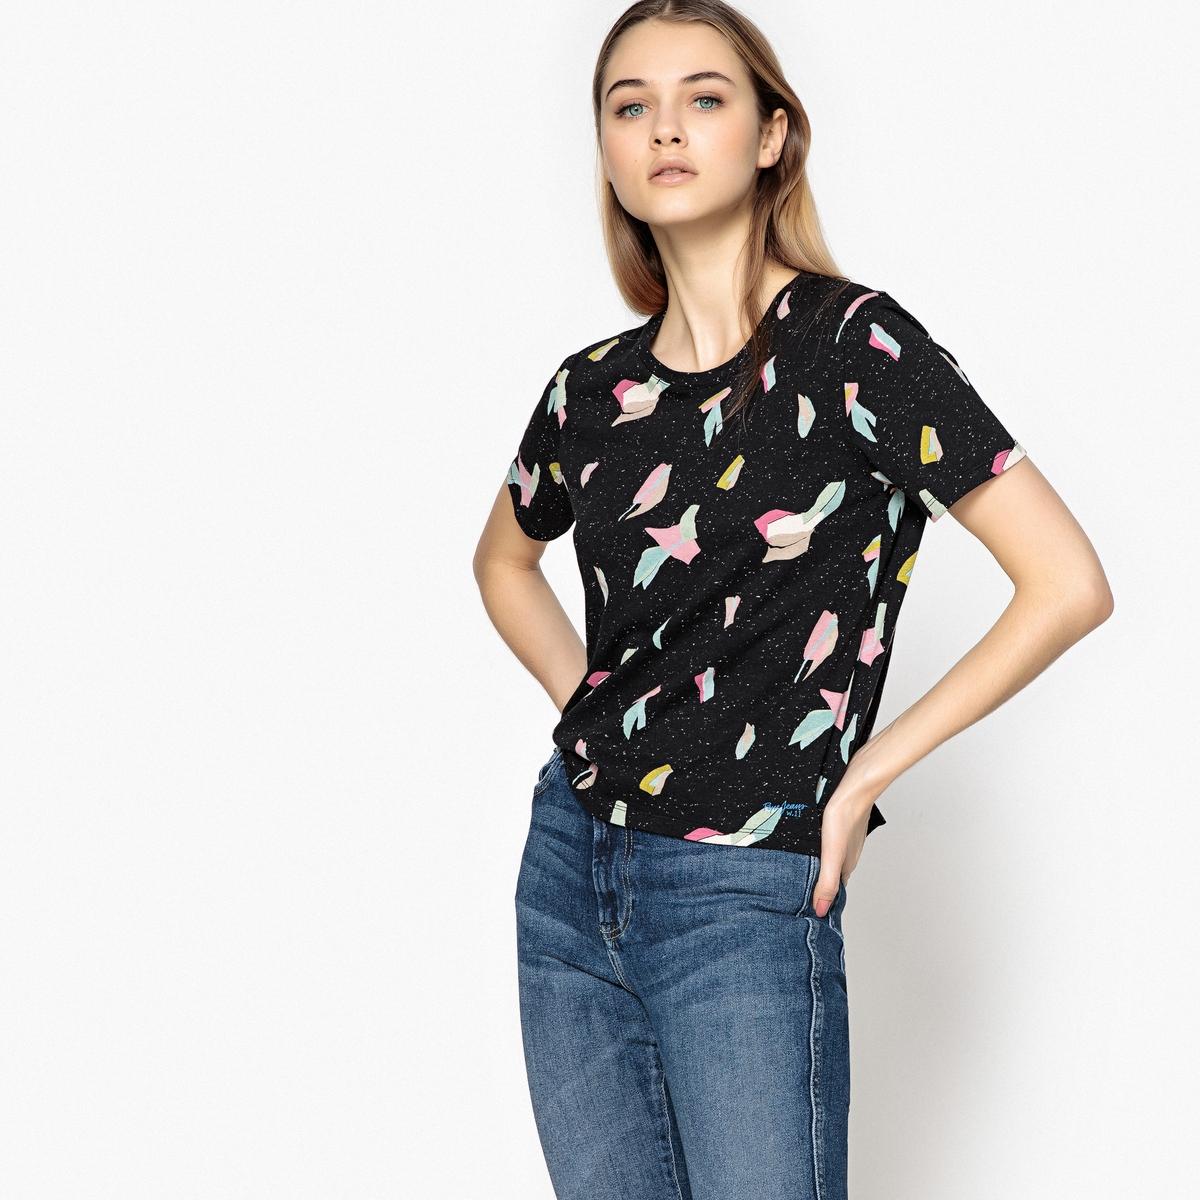 Camiseta con cuello redondo estampada